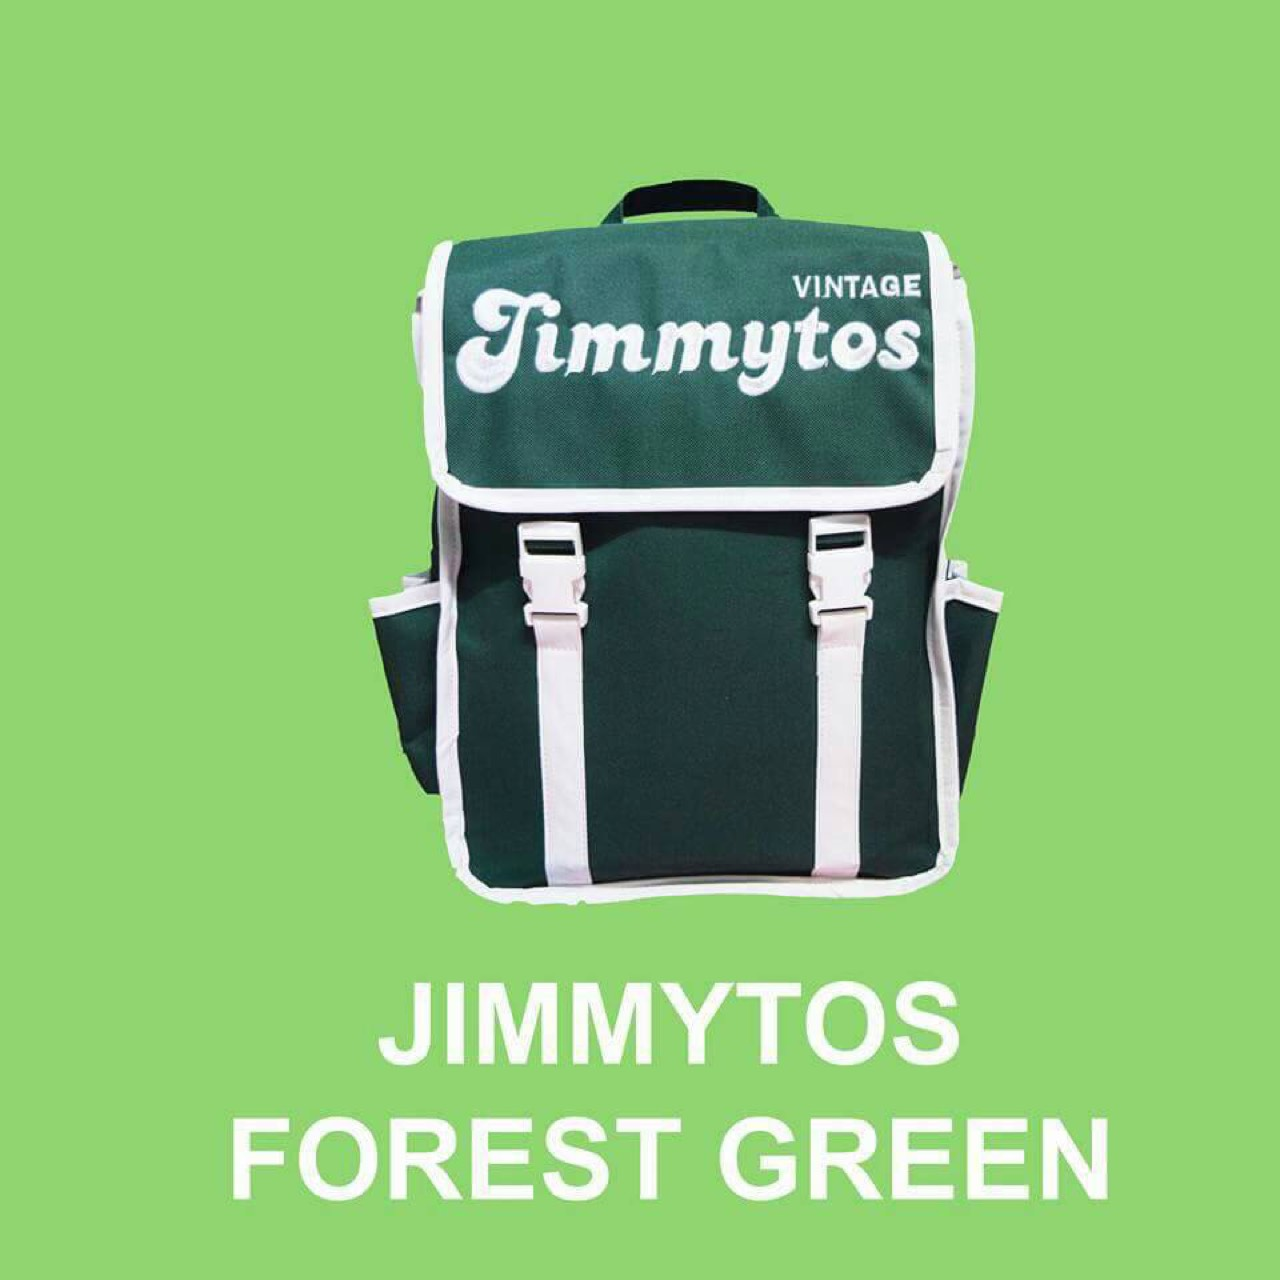 JIMMYTOS,จิมมี่ทอสไม่ซ้ำใคร,กระเป๋า,วินเทจ,กระเป๋าแฟชั่น,เป้,กระเป๋าเป้,กระเป๋าเดินทาง,กระเป๋าลุยๆ,รับ,anello,kanken,bag,bags,แฟชั่น,เสื้อผ้าแฟชั่น,backpack,กระเป๋าสะพายไหล่พี่,jimmytosbrand